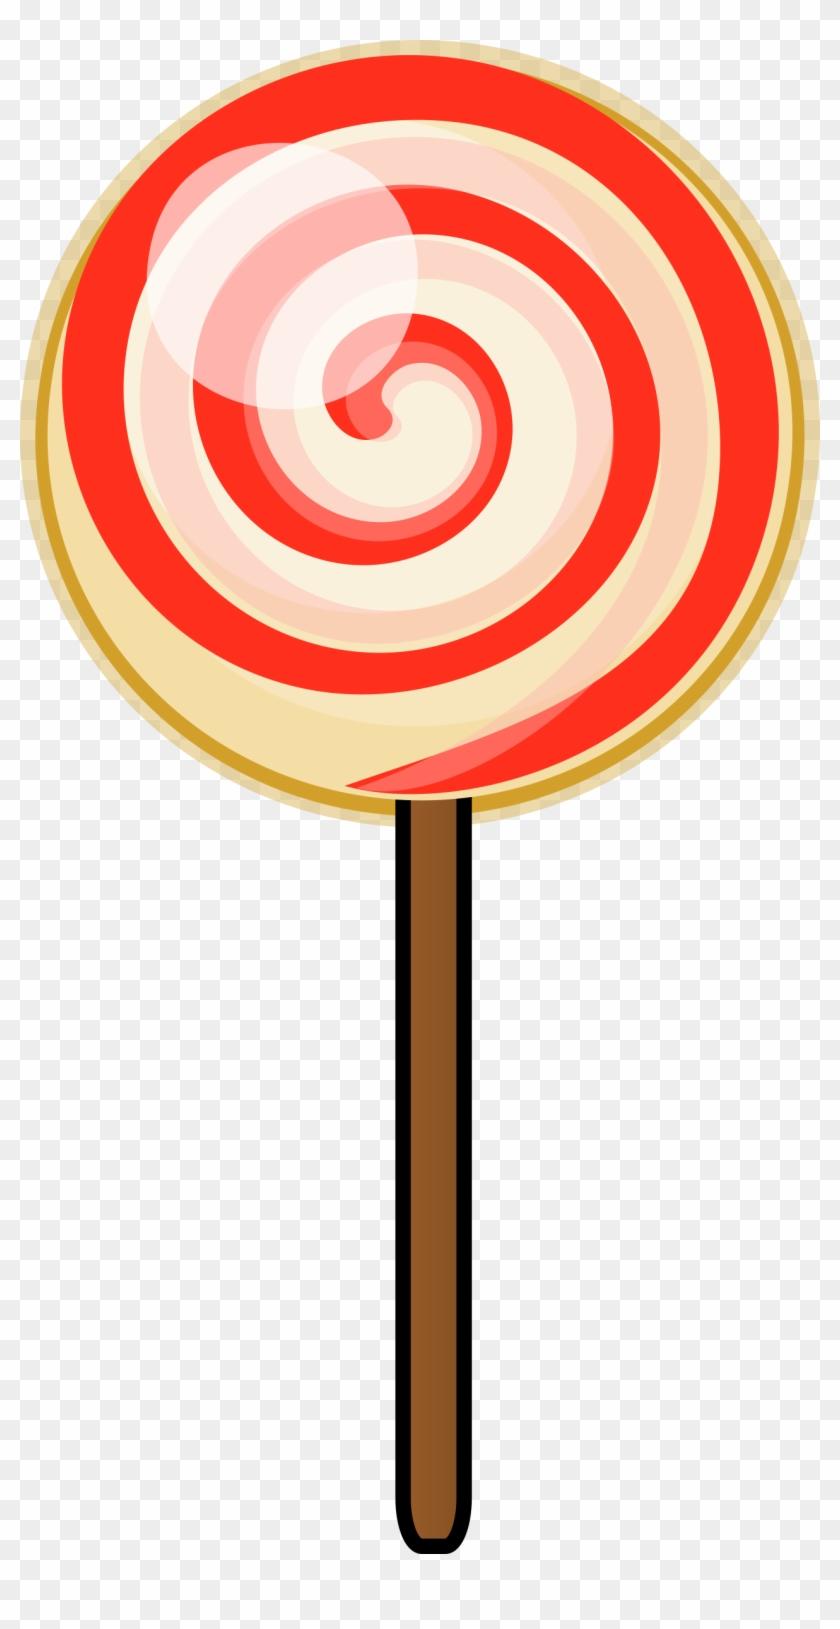 hight resolution of office clip art striped lollipop clipart free download lollipop png